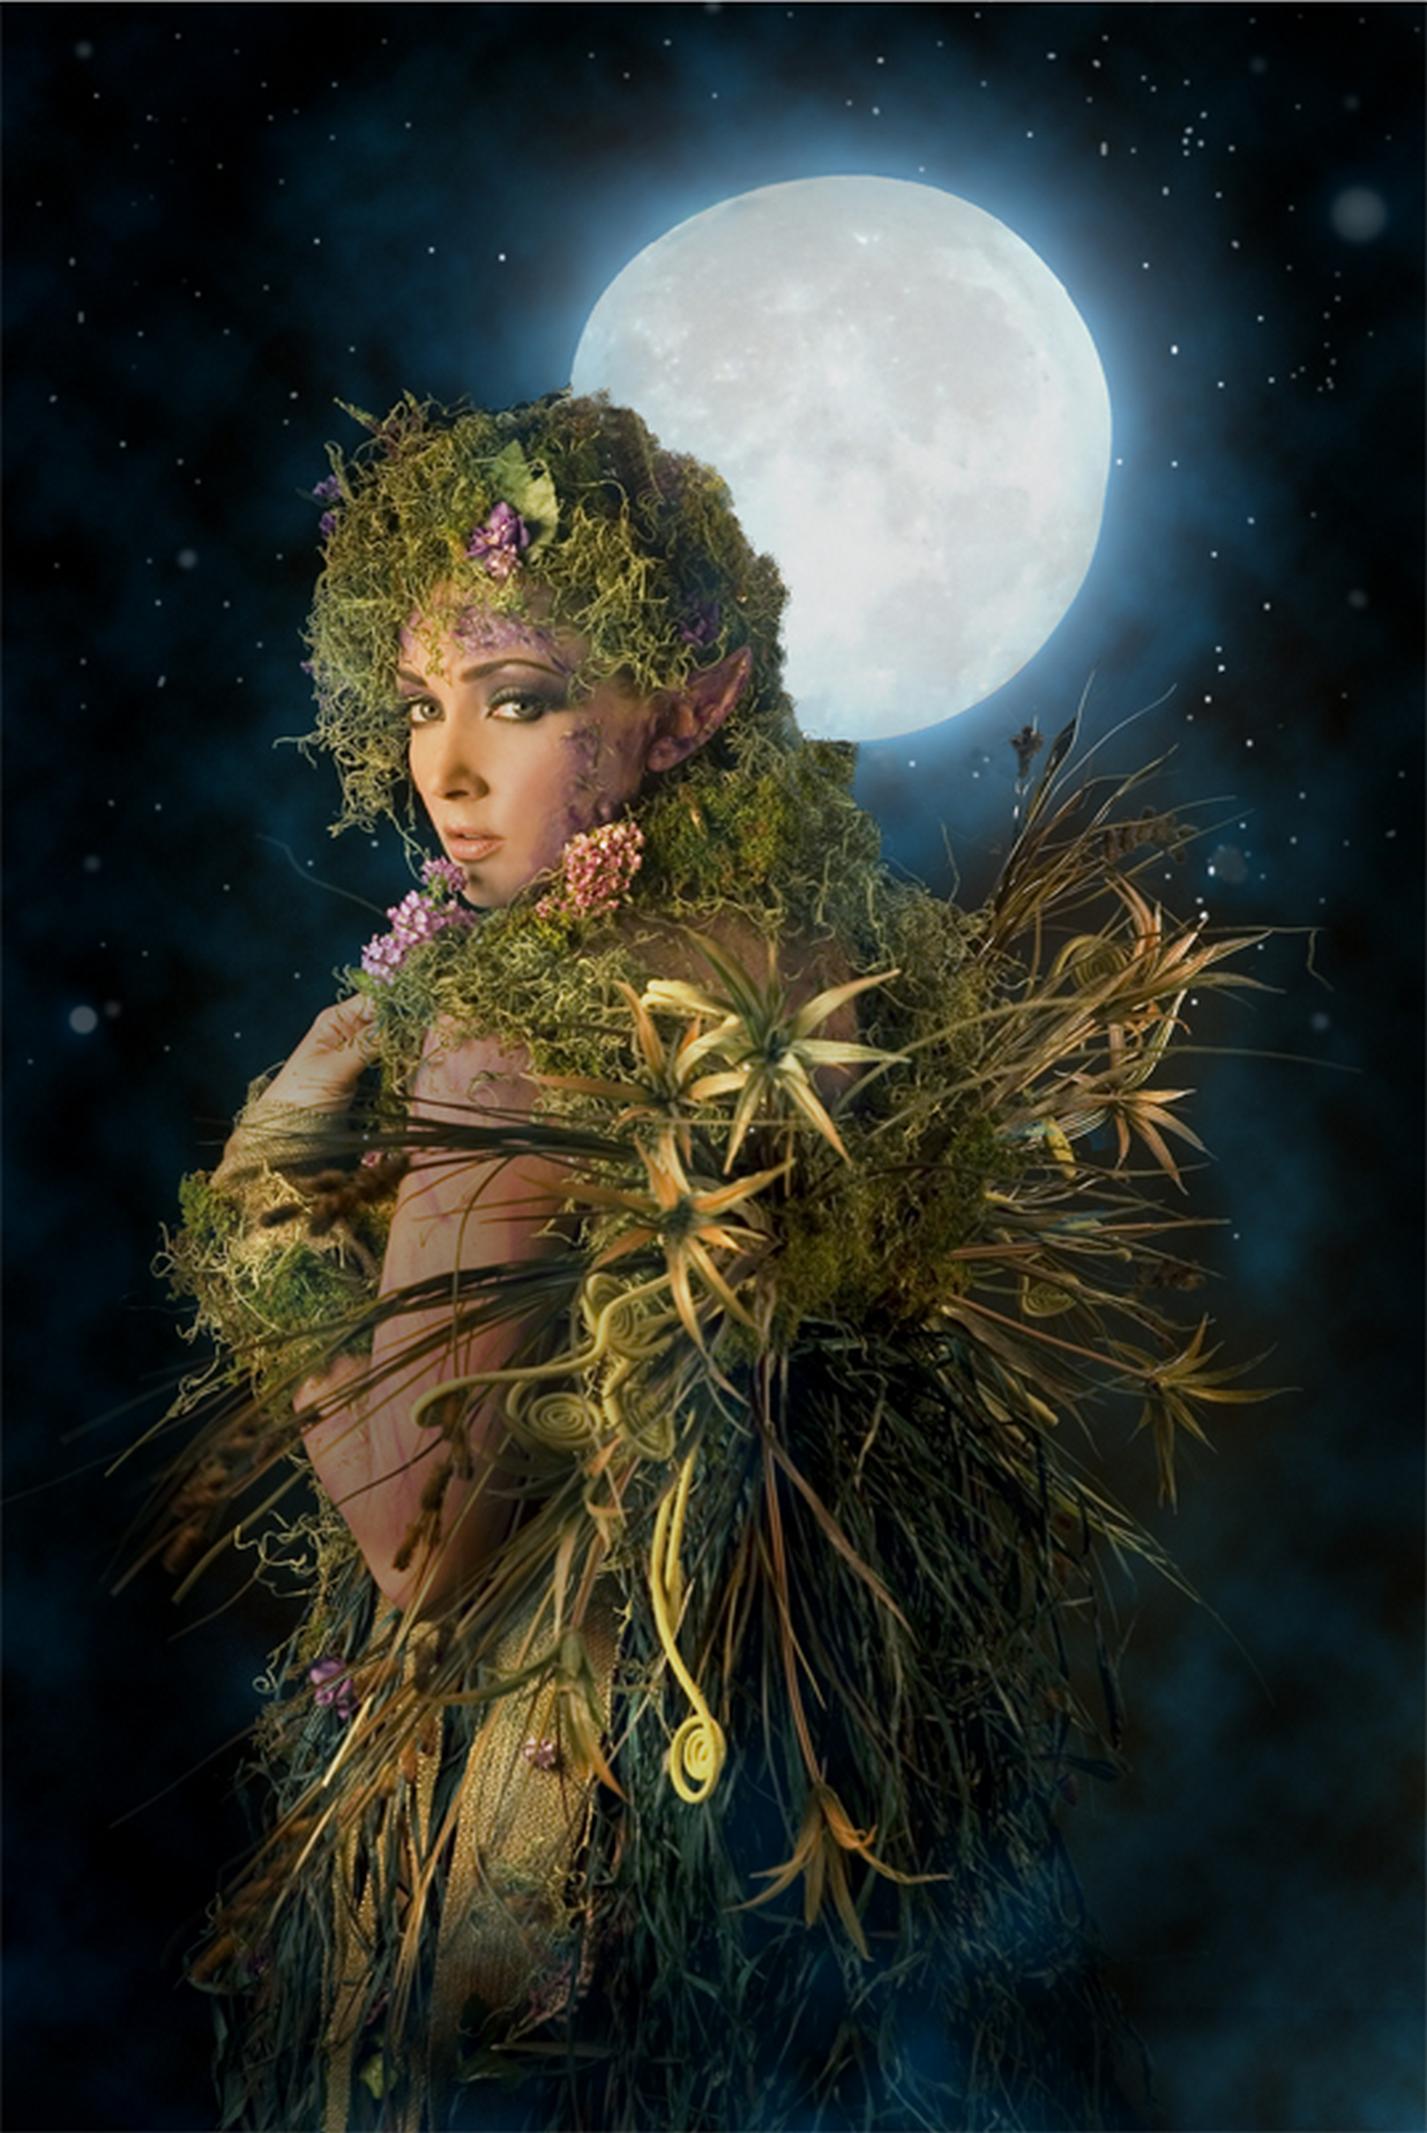 Sexy woodlen elf hentia photo